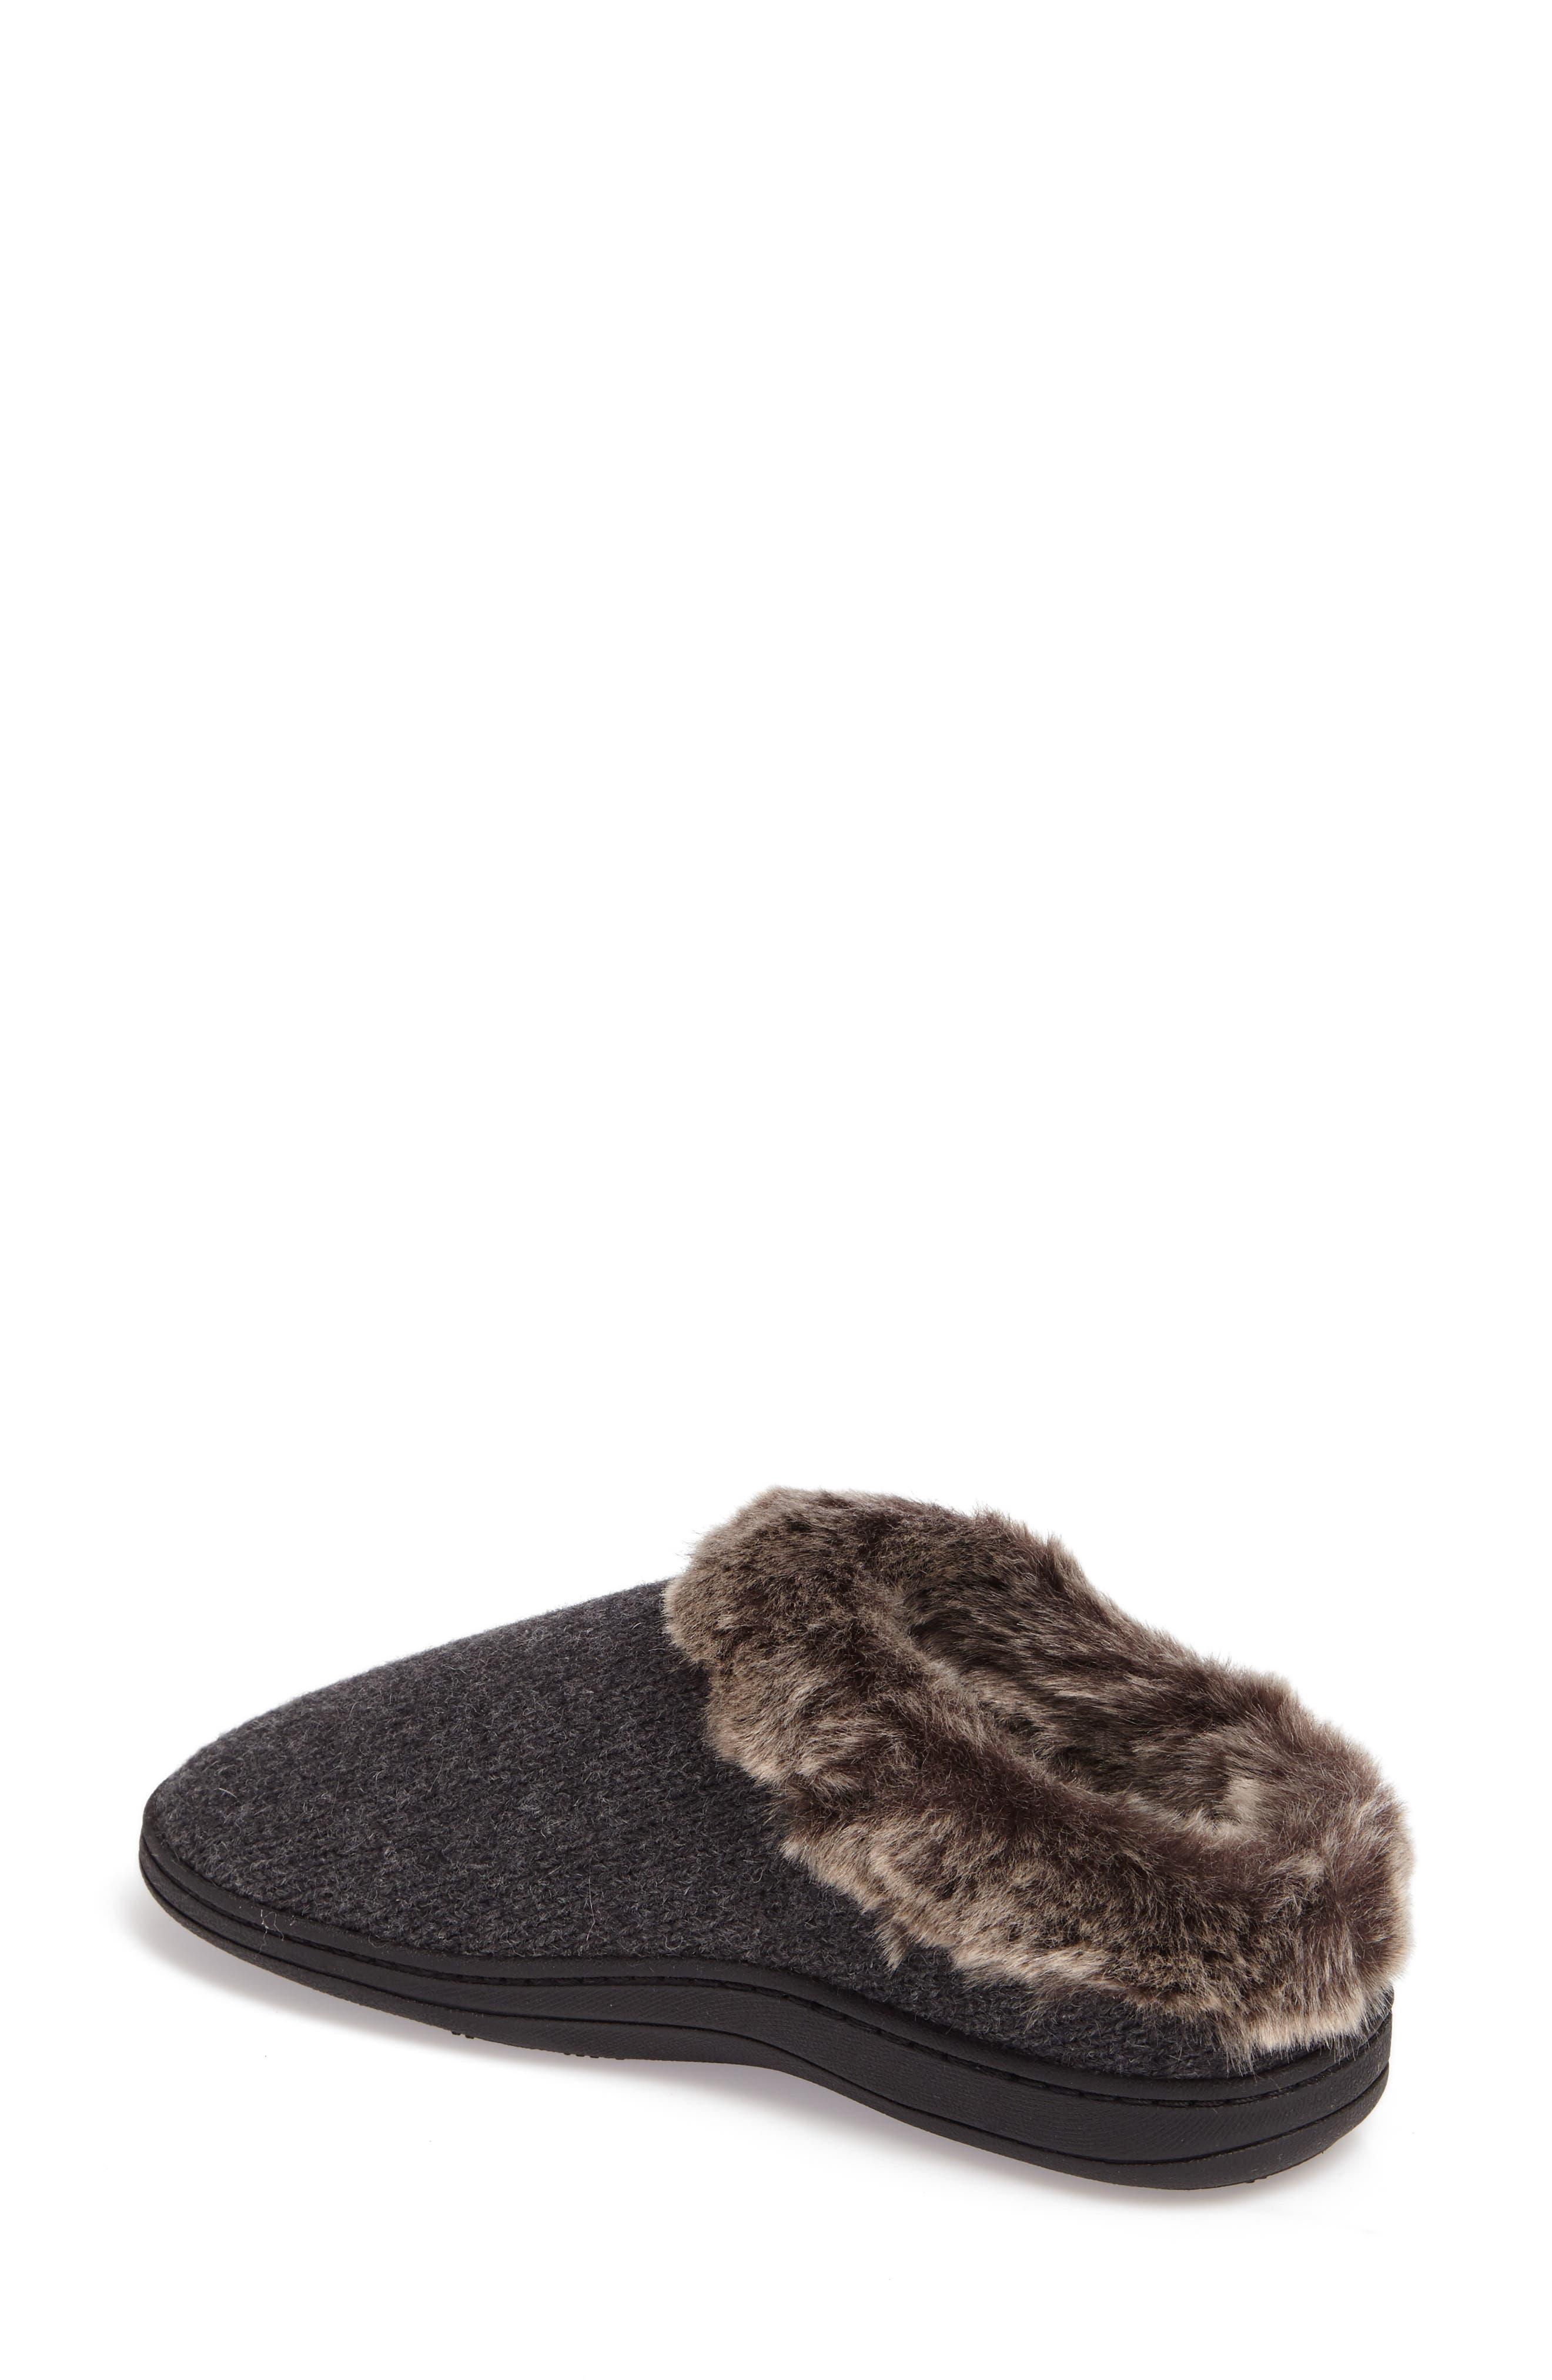 Chinchilla Faux Fur Slipper,                             Alternate thumbnail 2, color,                             Dark Charcoal Heather